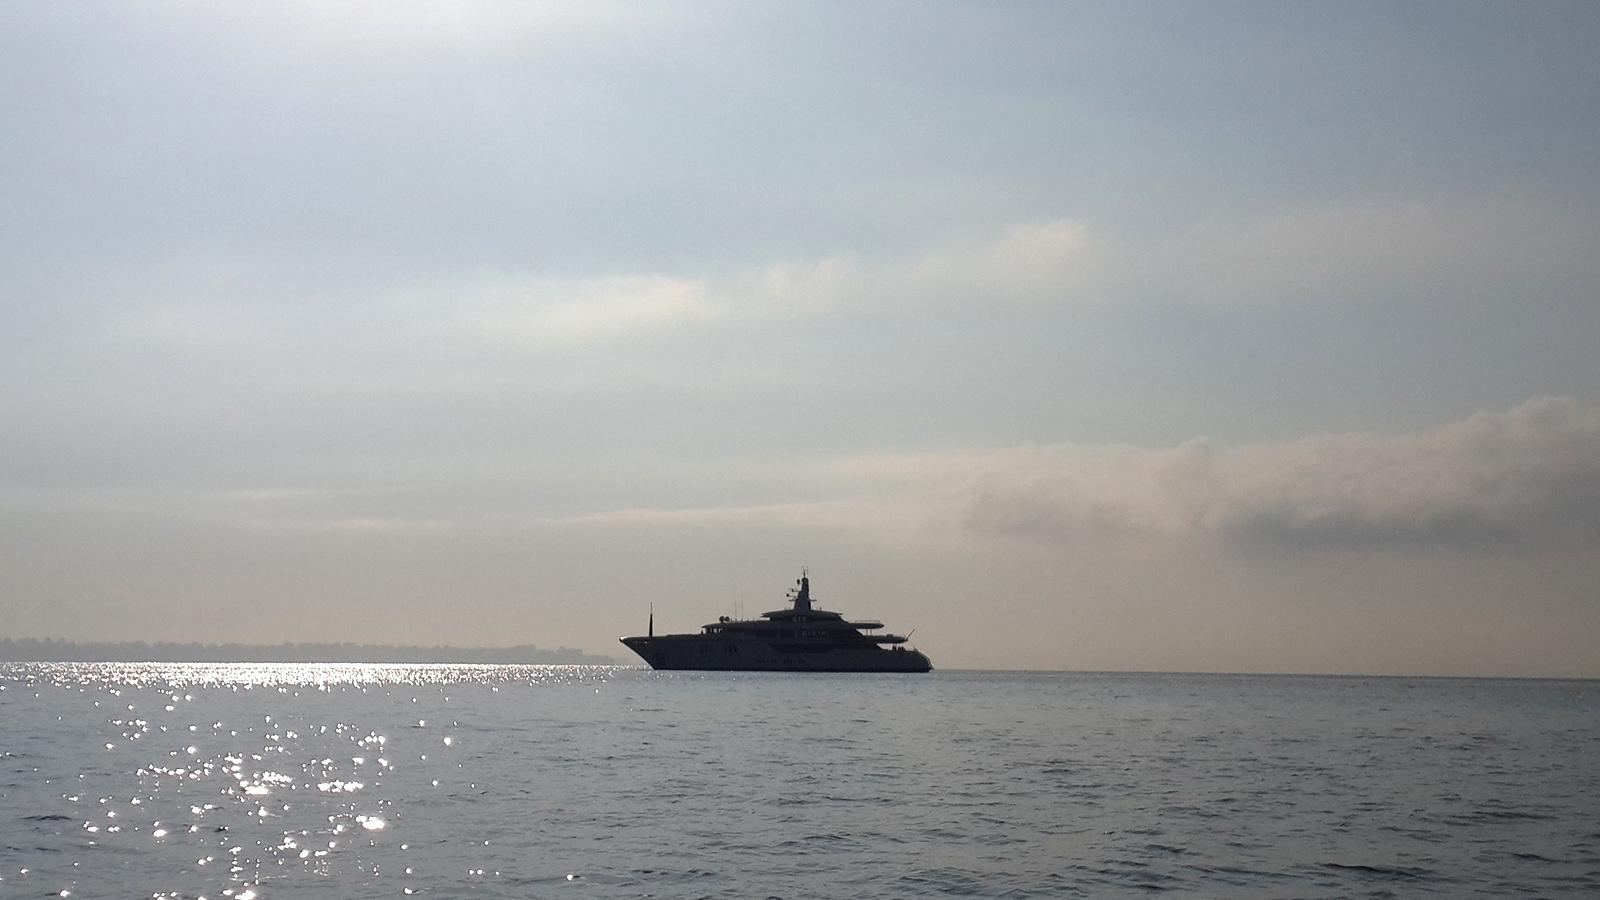 Irimari Yacht Delivery